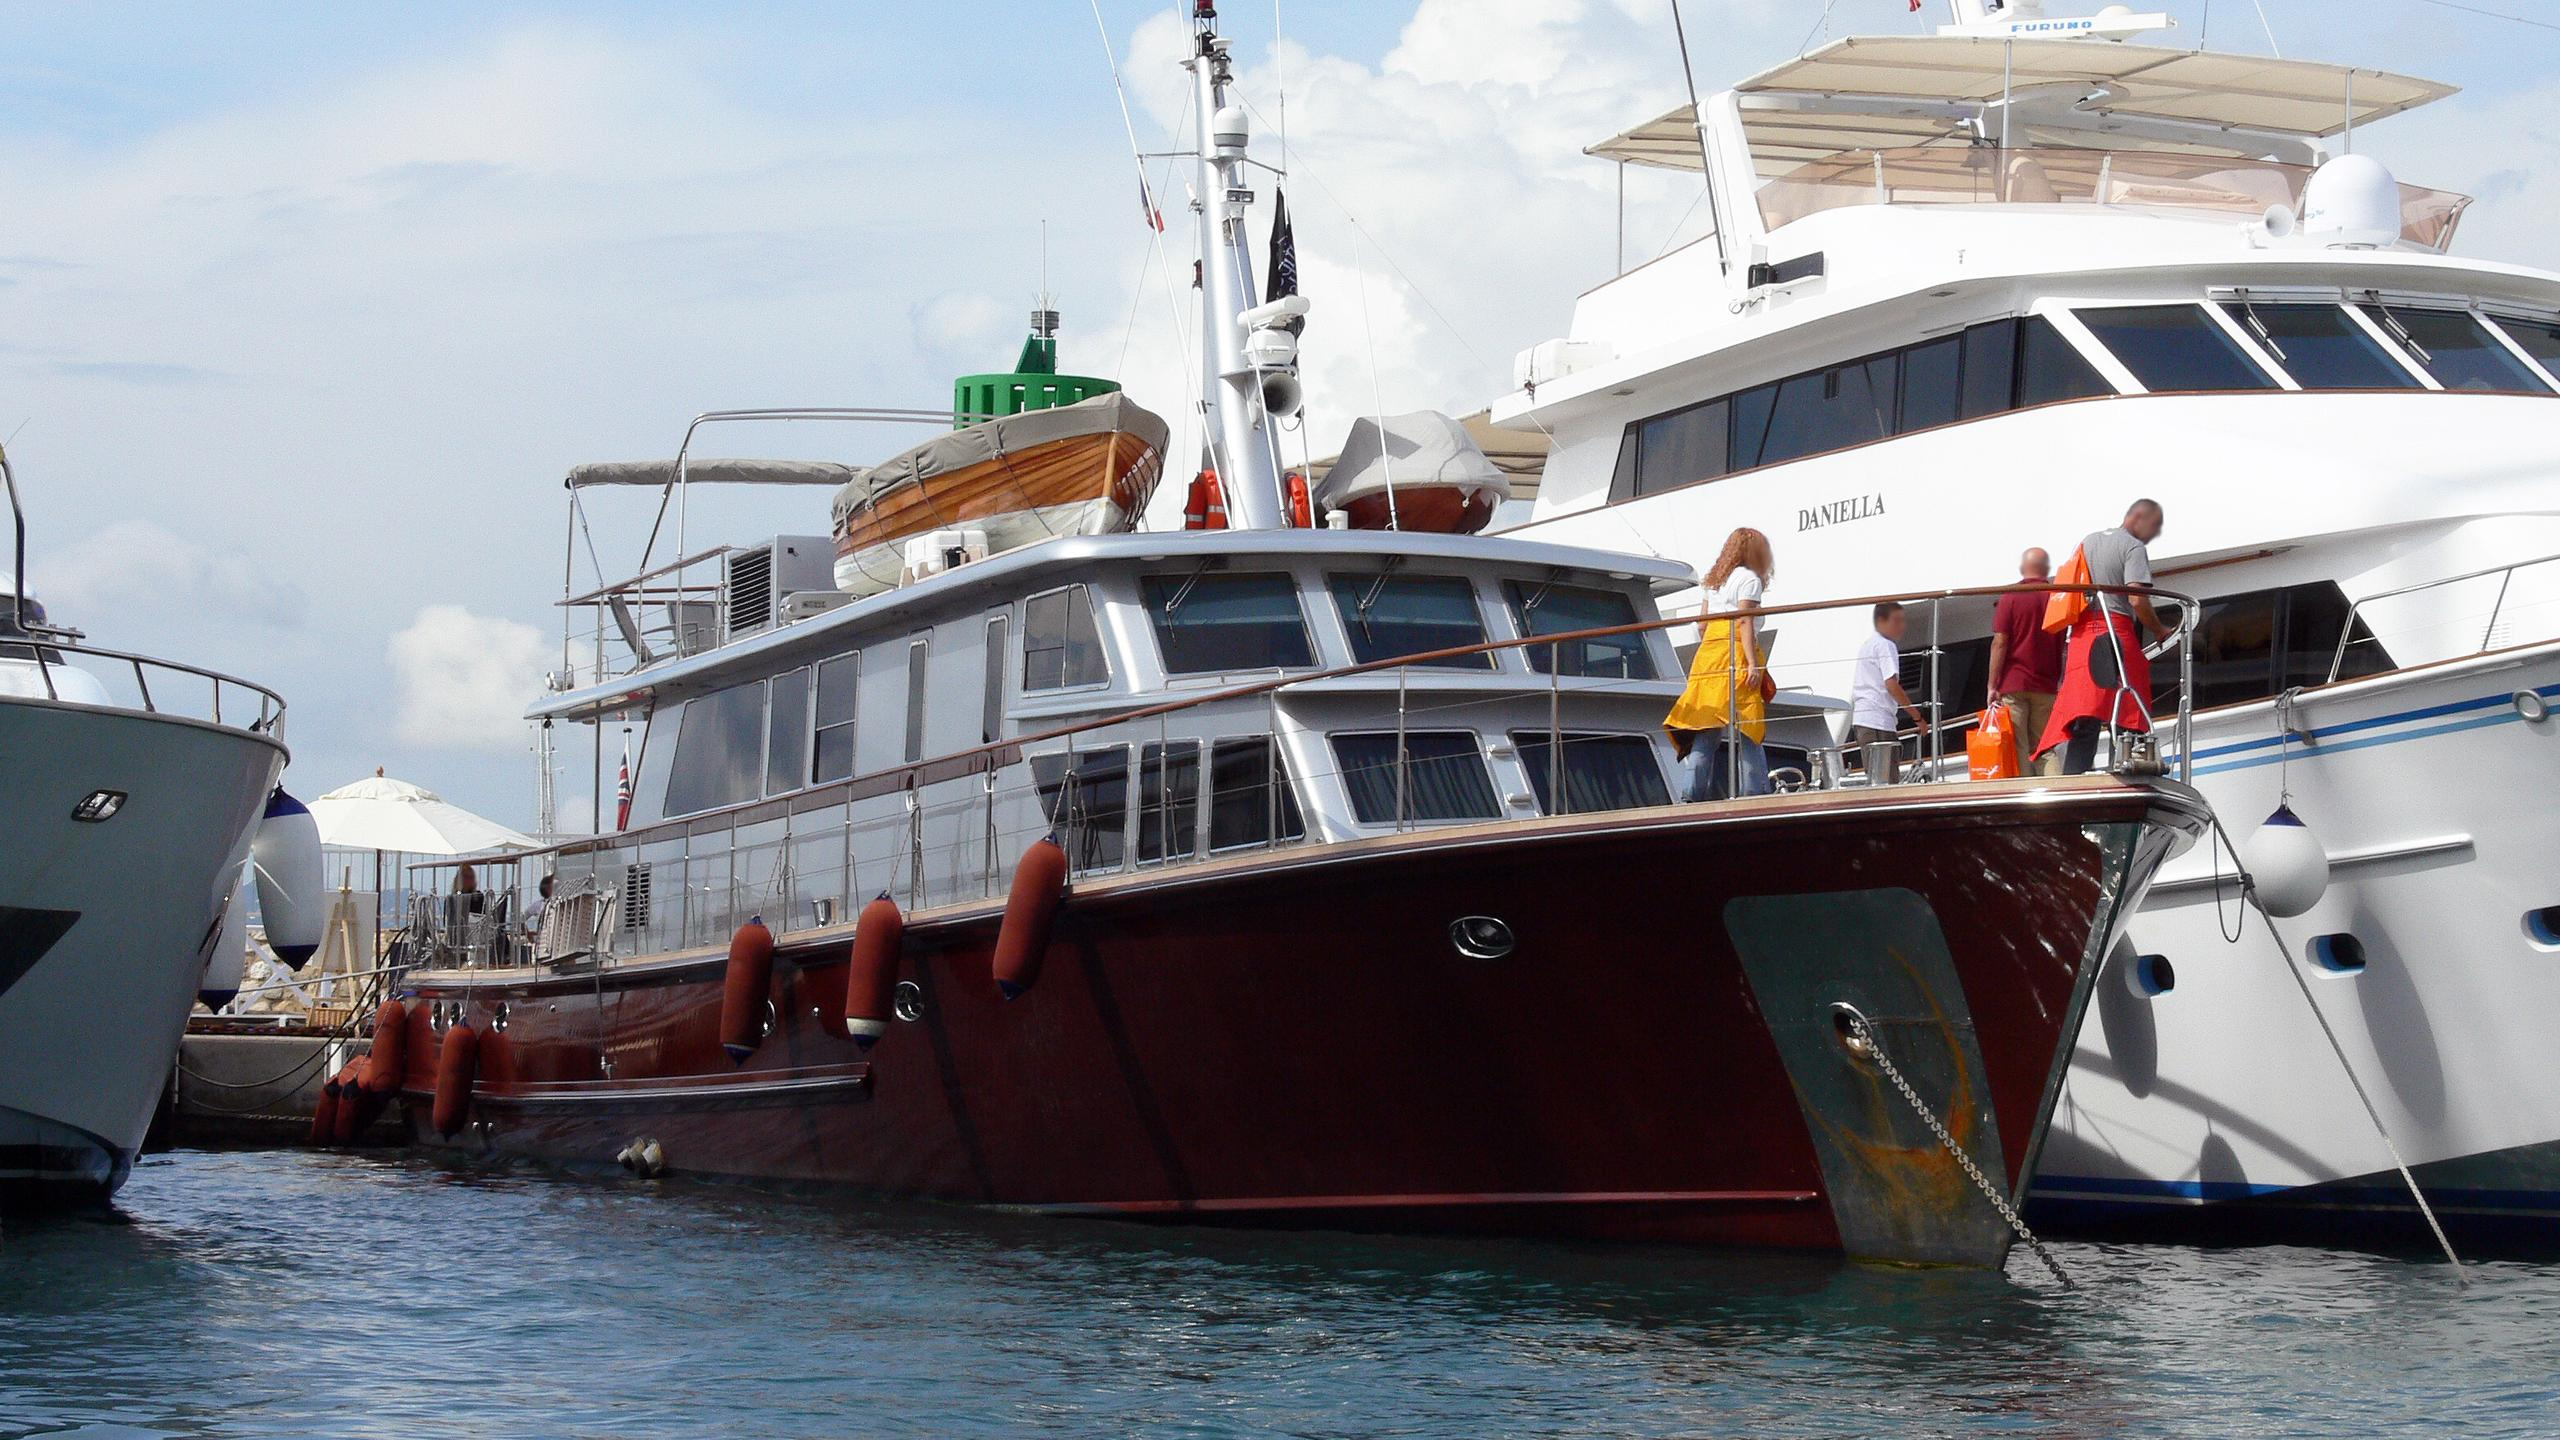 tempest-ws-motor-yacht-esterel-1963-32m-bow